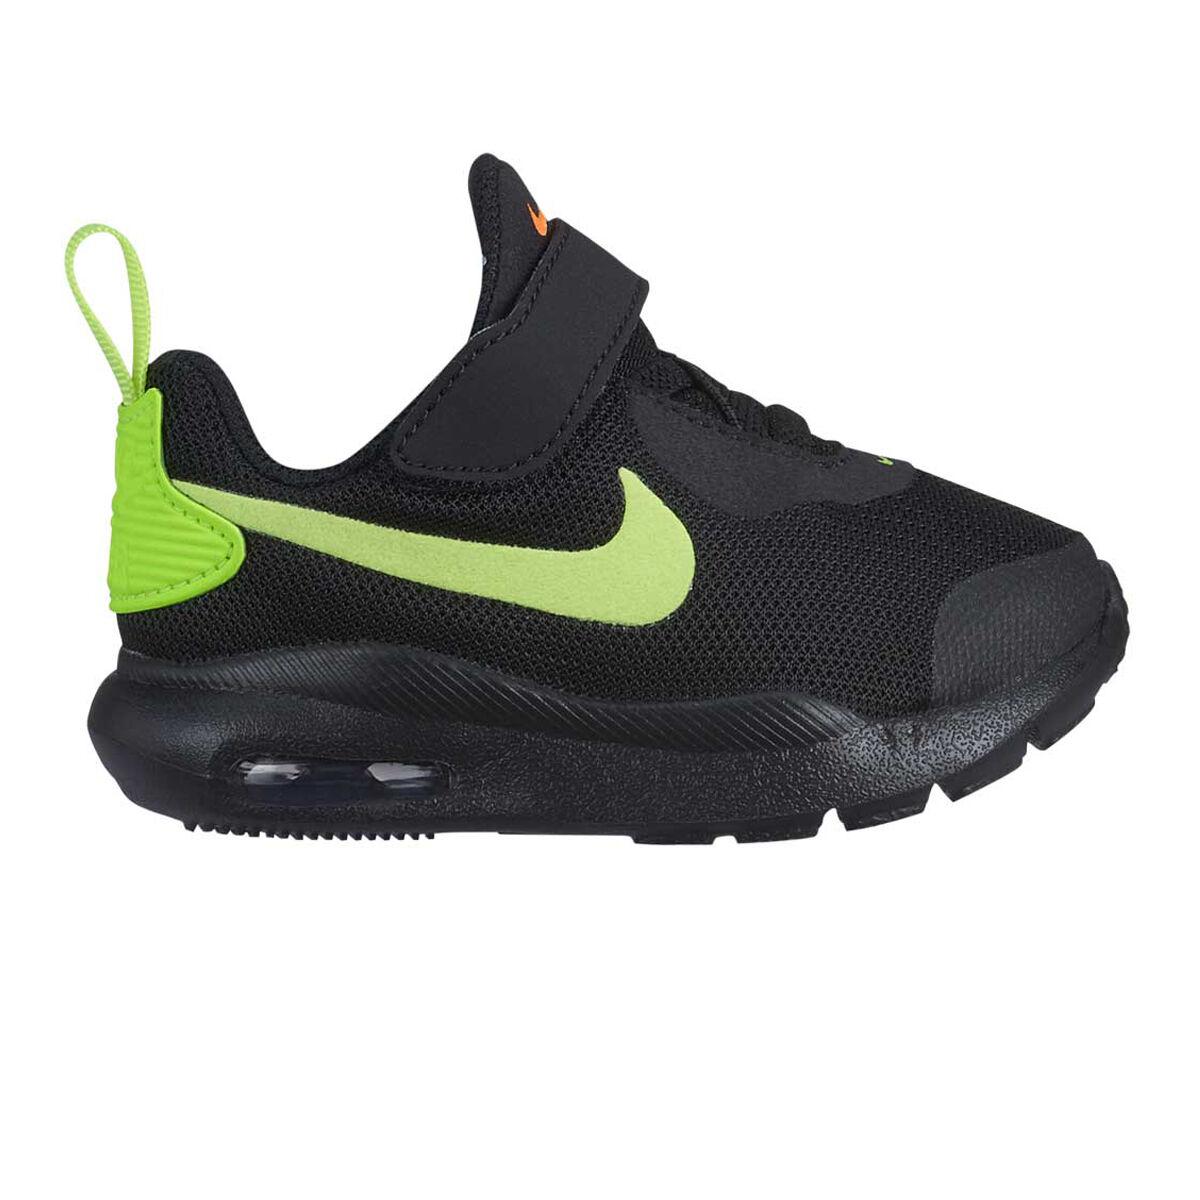 Nike Air Max Oketo Toddlers Shoes